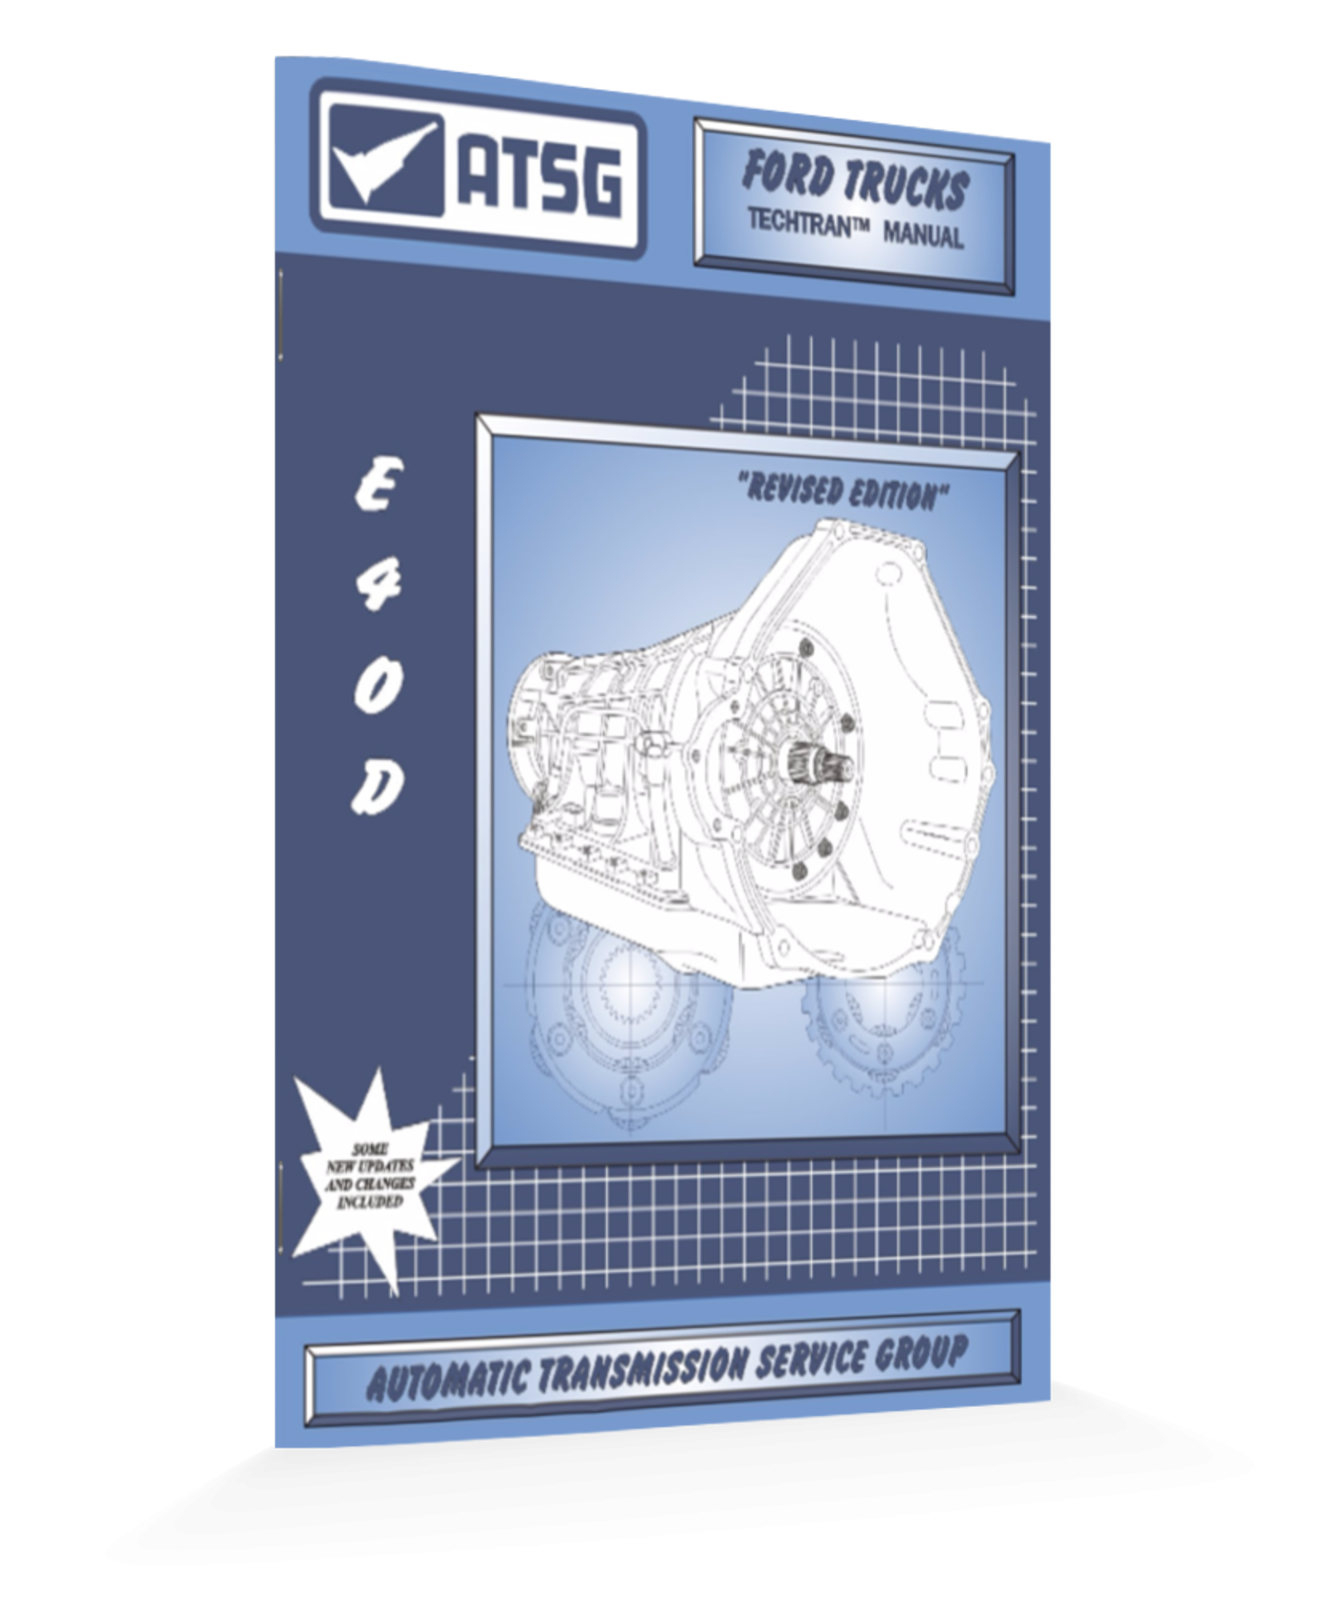 ford e4od transmission parts diagram ford e40d atsg transmission manual handbook repair guide book best  ford e40d atsg transmission manual